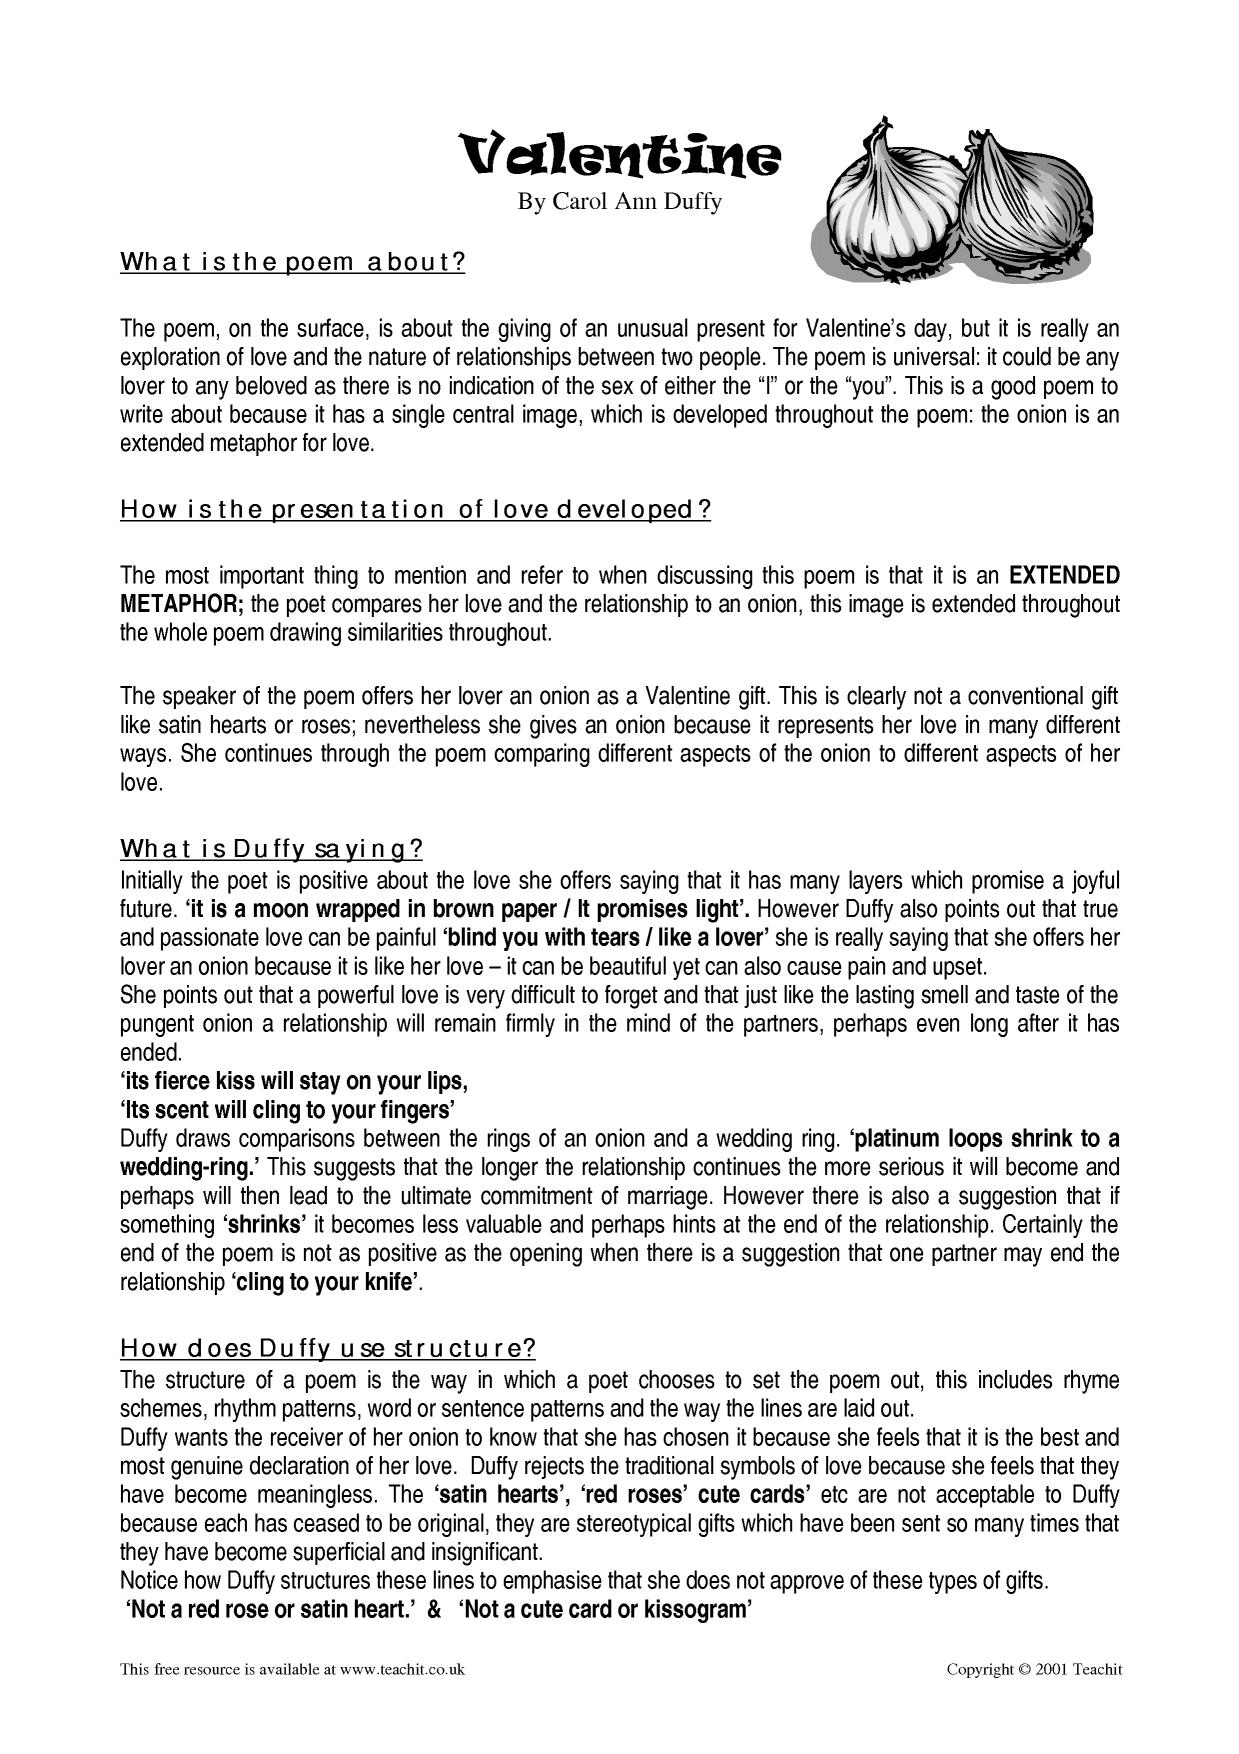 valentine carol ann duffy essay plan Compare and contrast essay high school vs university yoga plan valentine duffy carol essay ann xenotransplantation dissertation proposal social media and self.